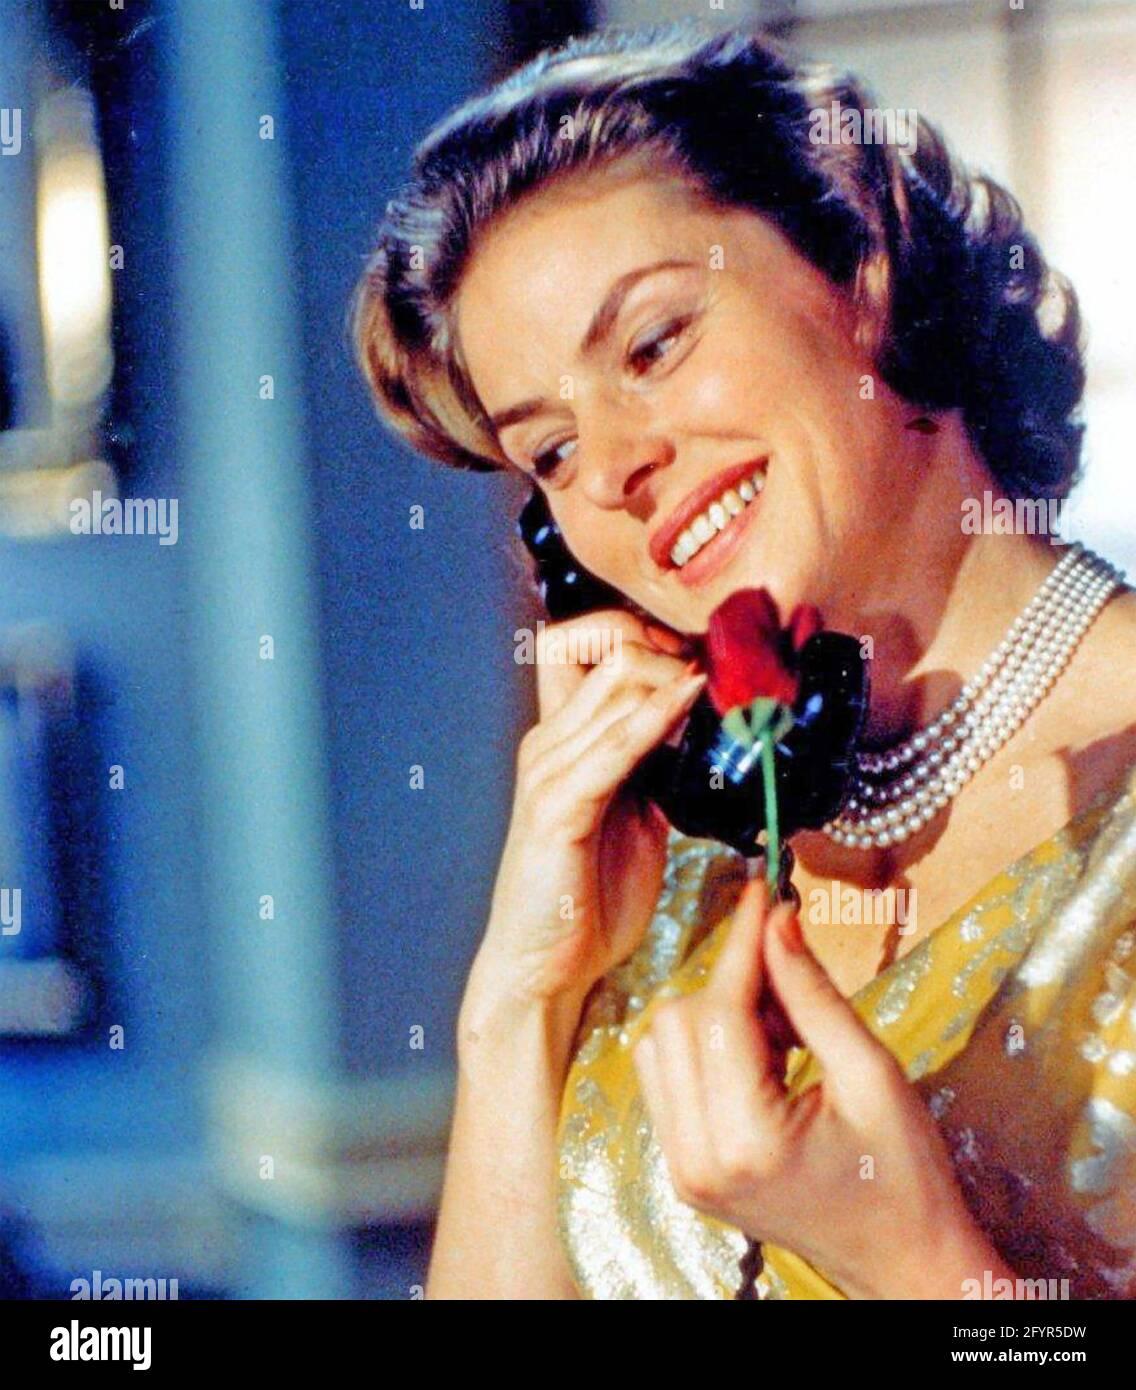 INGRID BERGMAN (1915-1982) Swedish film actress about 1955 Stock Photo